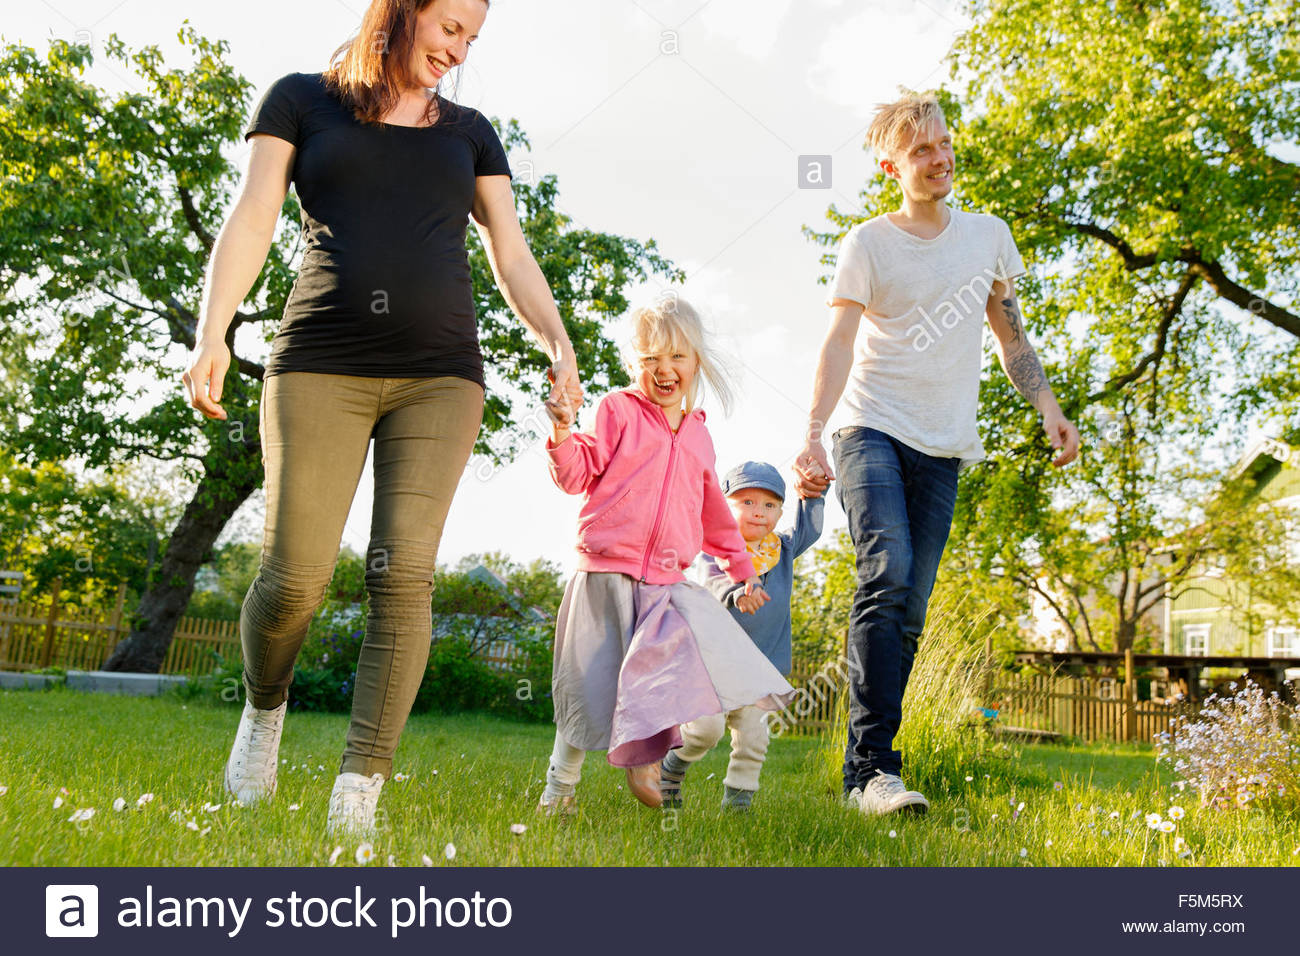 La Suède, Sodermanland, Jarna, famille avec deux enfants (4-5, 4-5) in garden Photo Stock